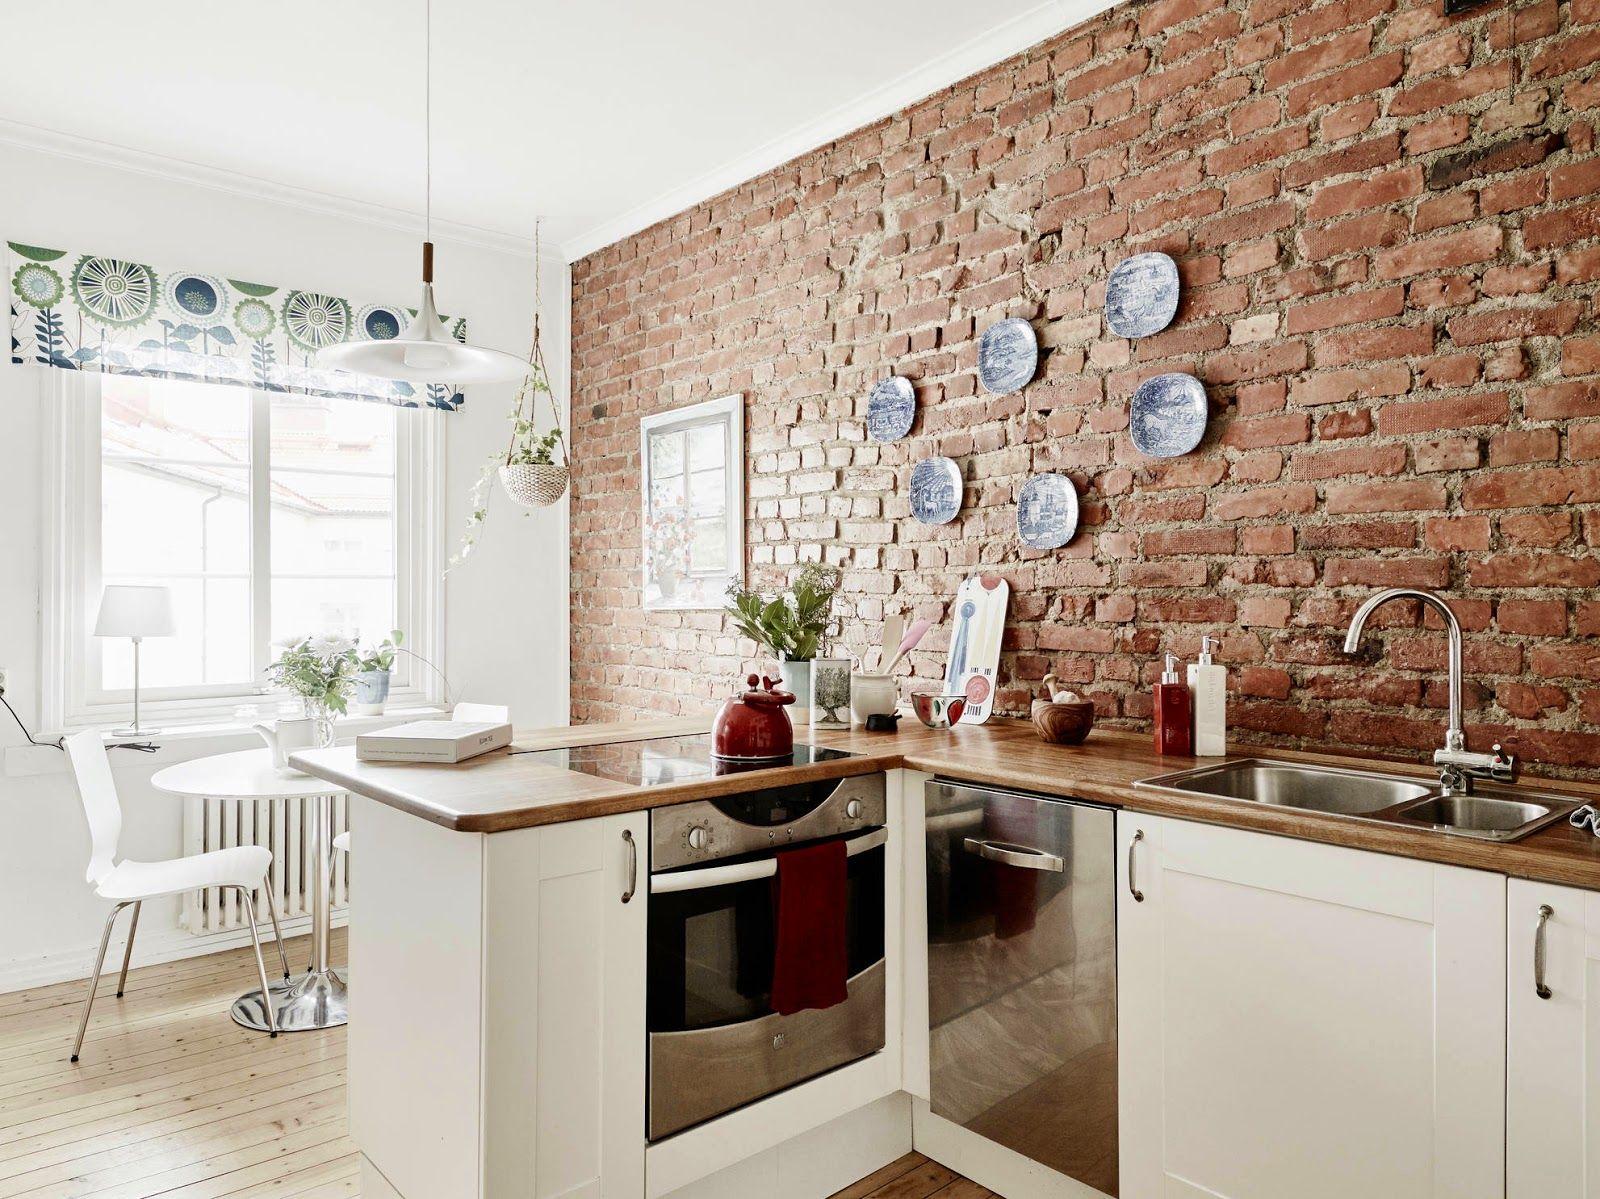 Risultati immagini per cucine mattoni | cucine | Mattoni a ...